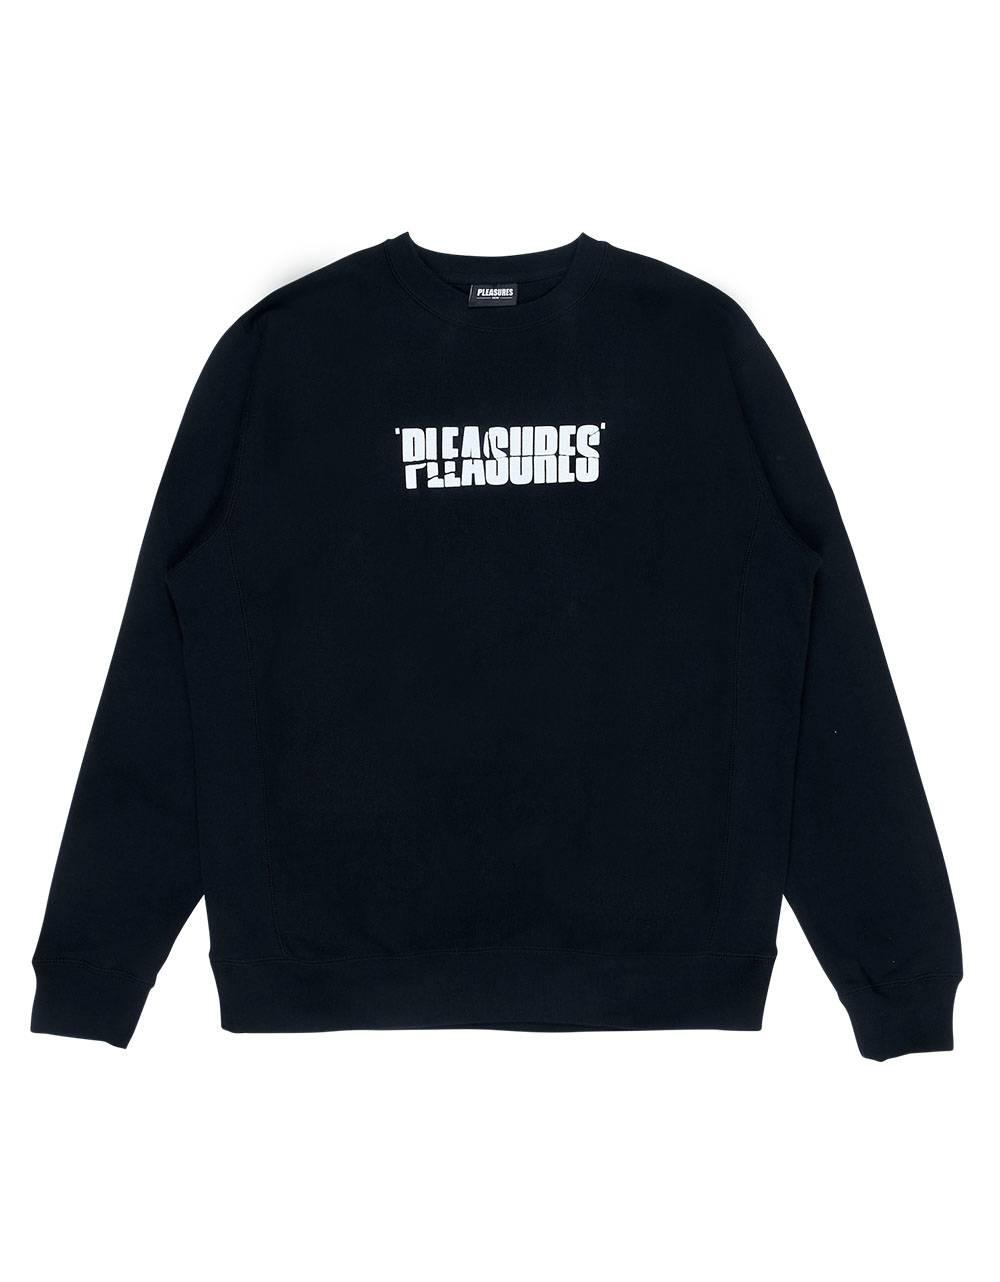 Pleasures Strees jazz premium crewneck sweater - black Pleasures Sweater 119,00€